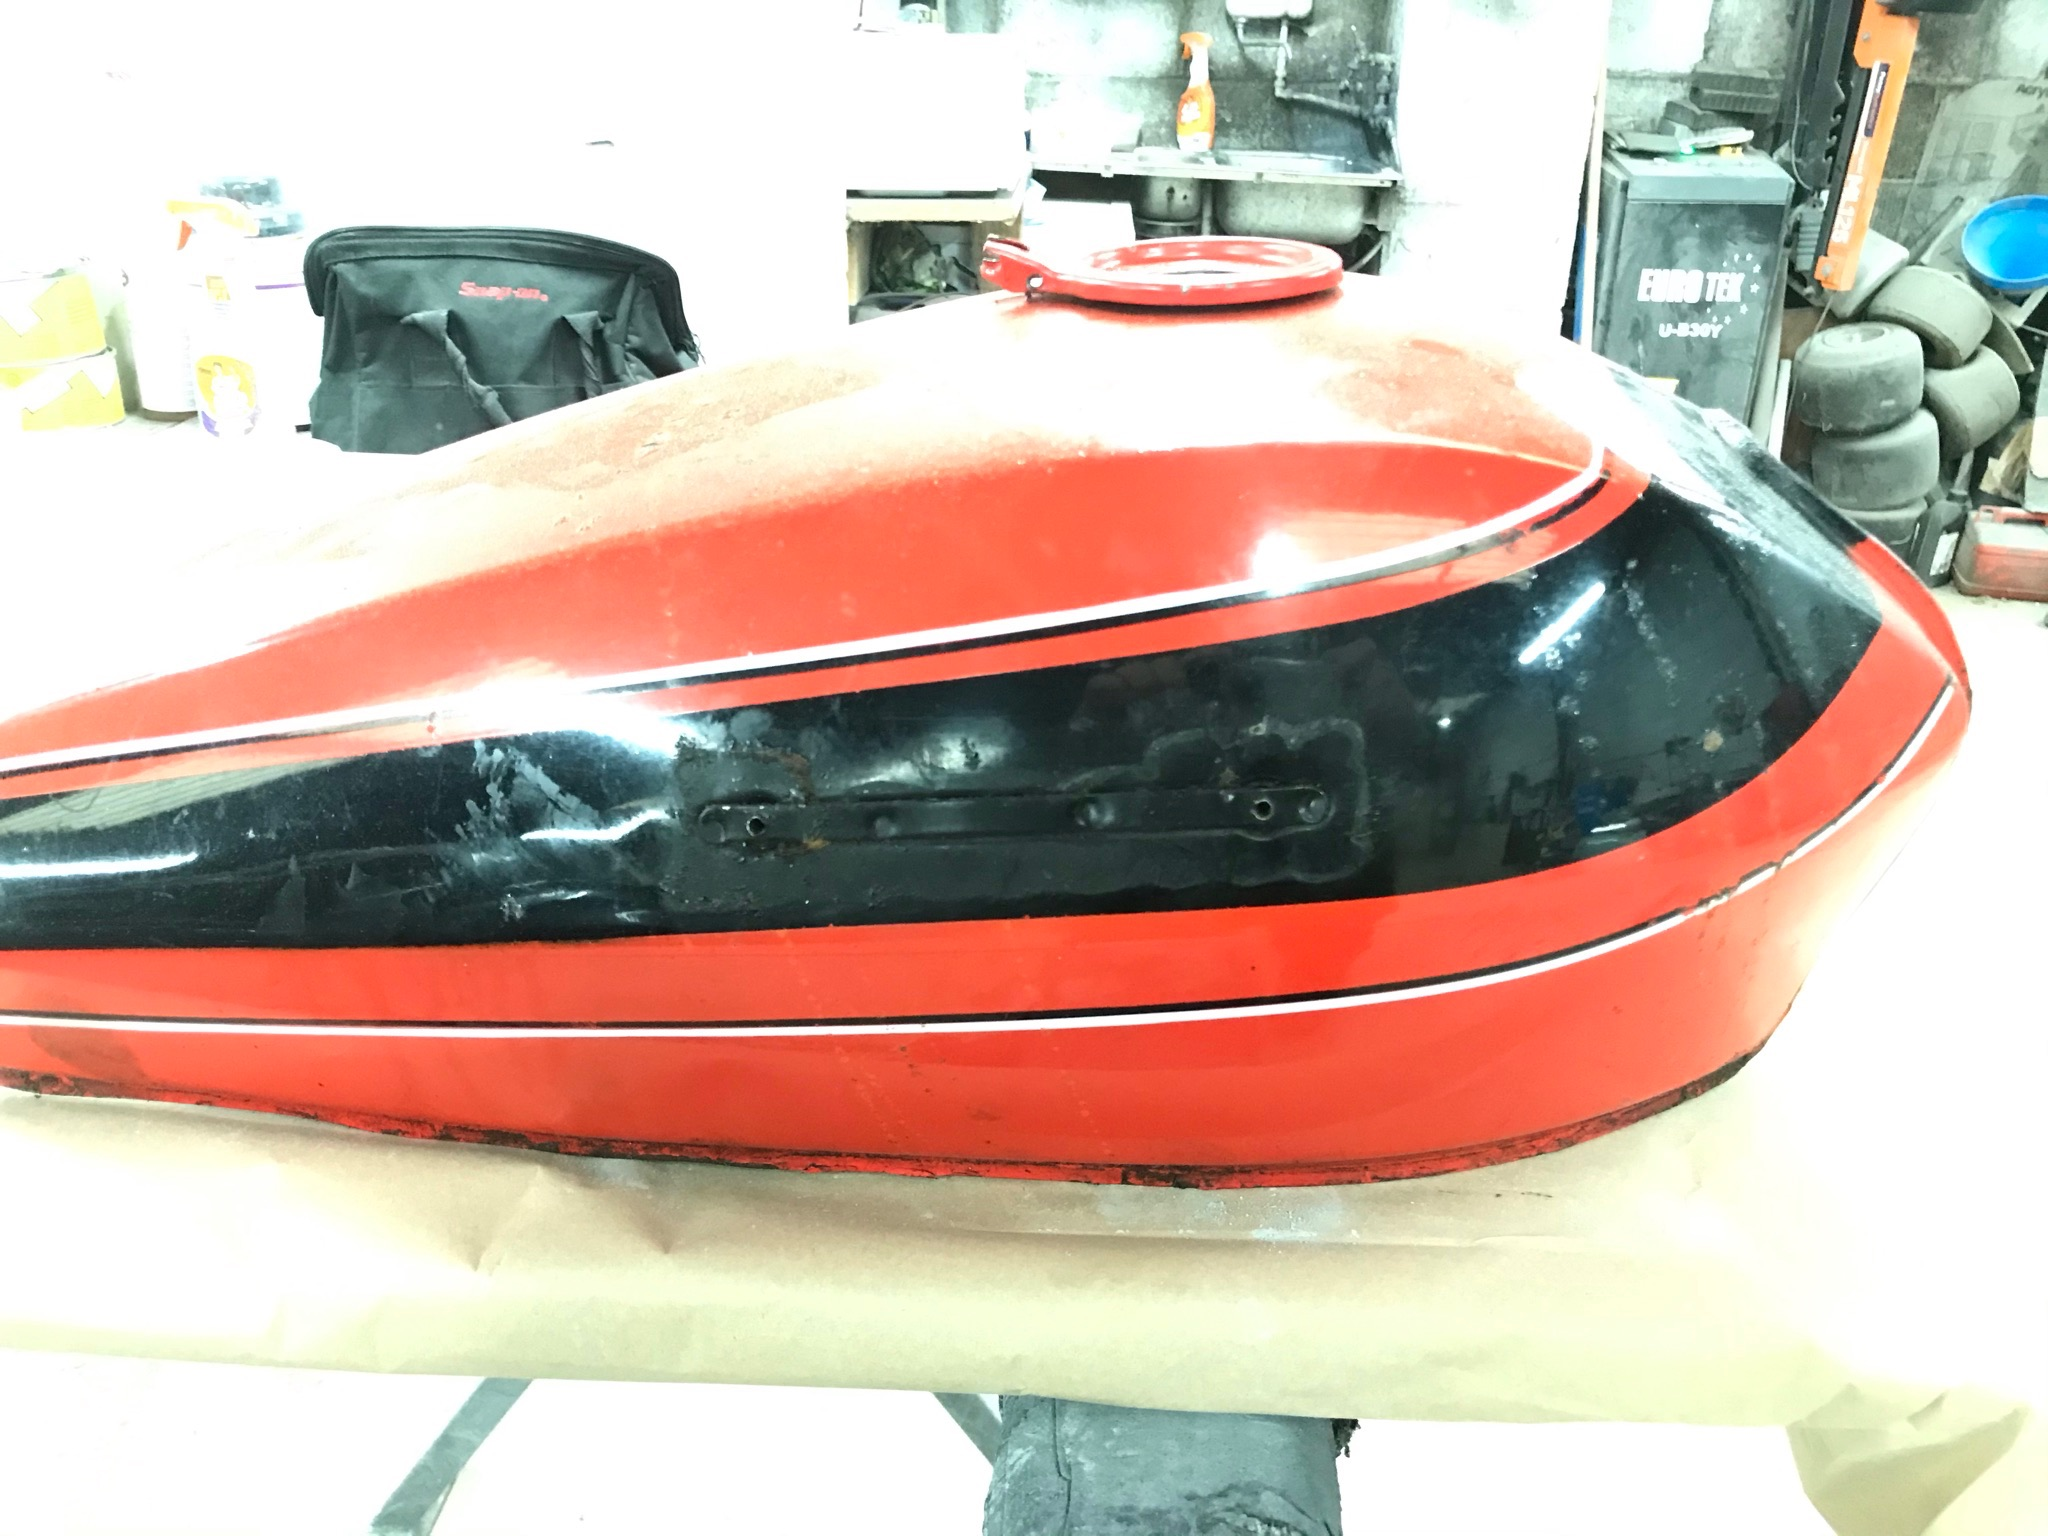 Benelli 250 2c Restoration-5741c1a6-8cab-4e70-af6f-48393c4d049e.jpeg